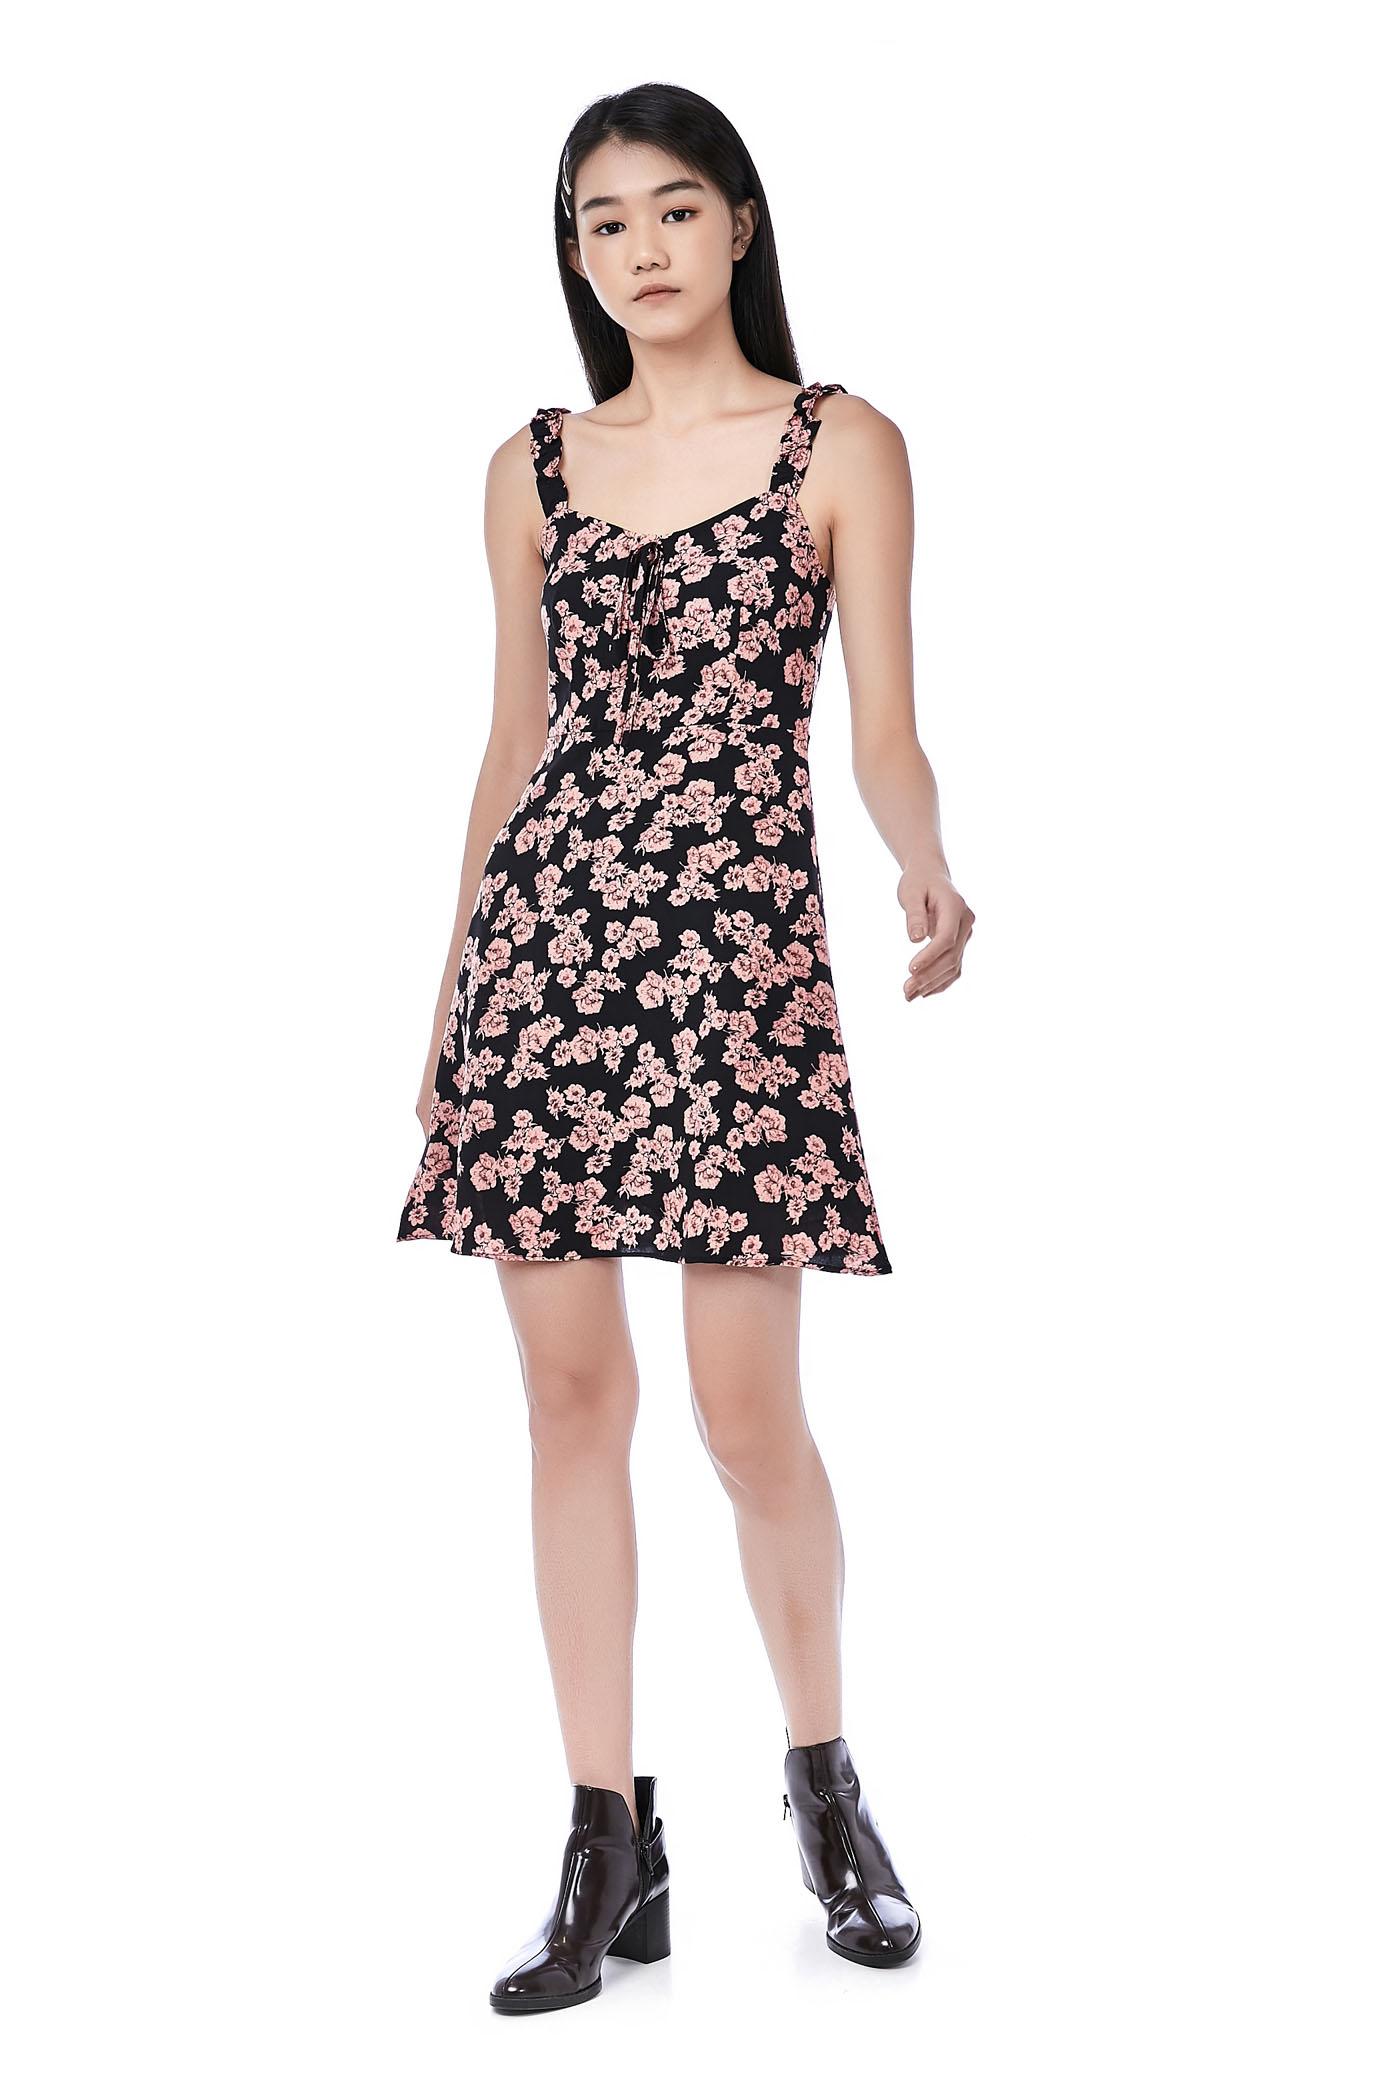 Seora Ruffle Strap Dress